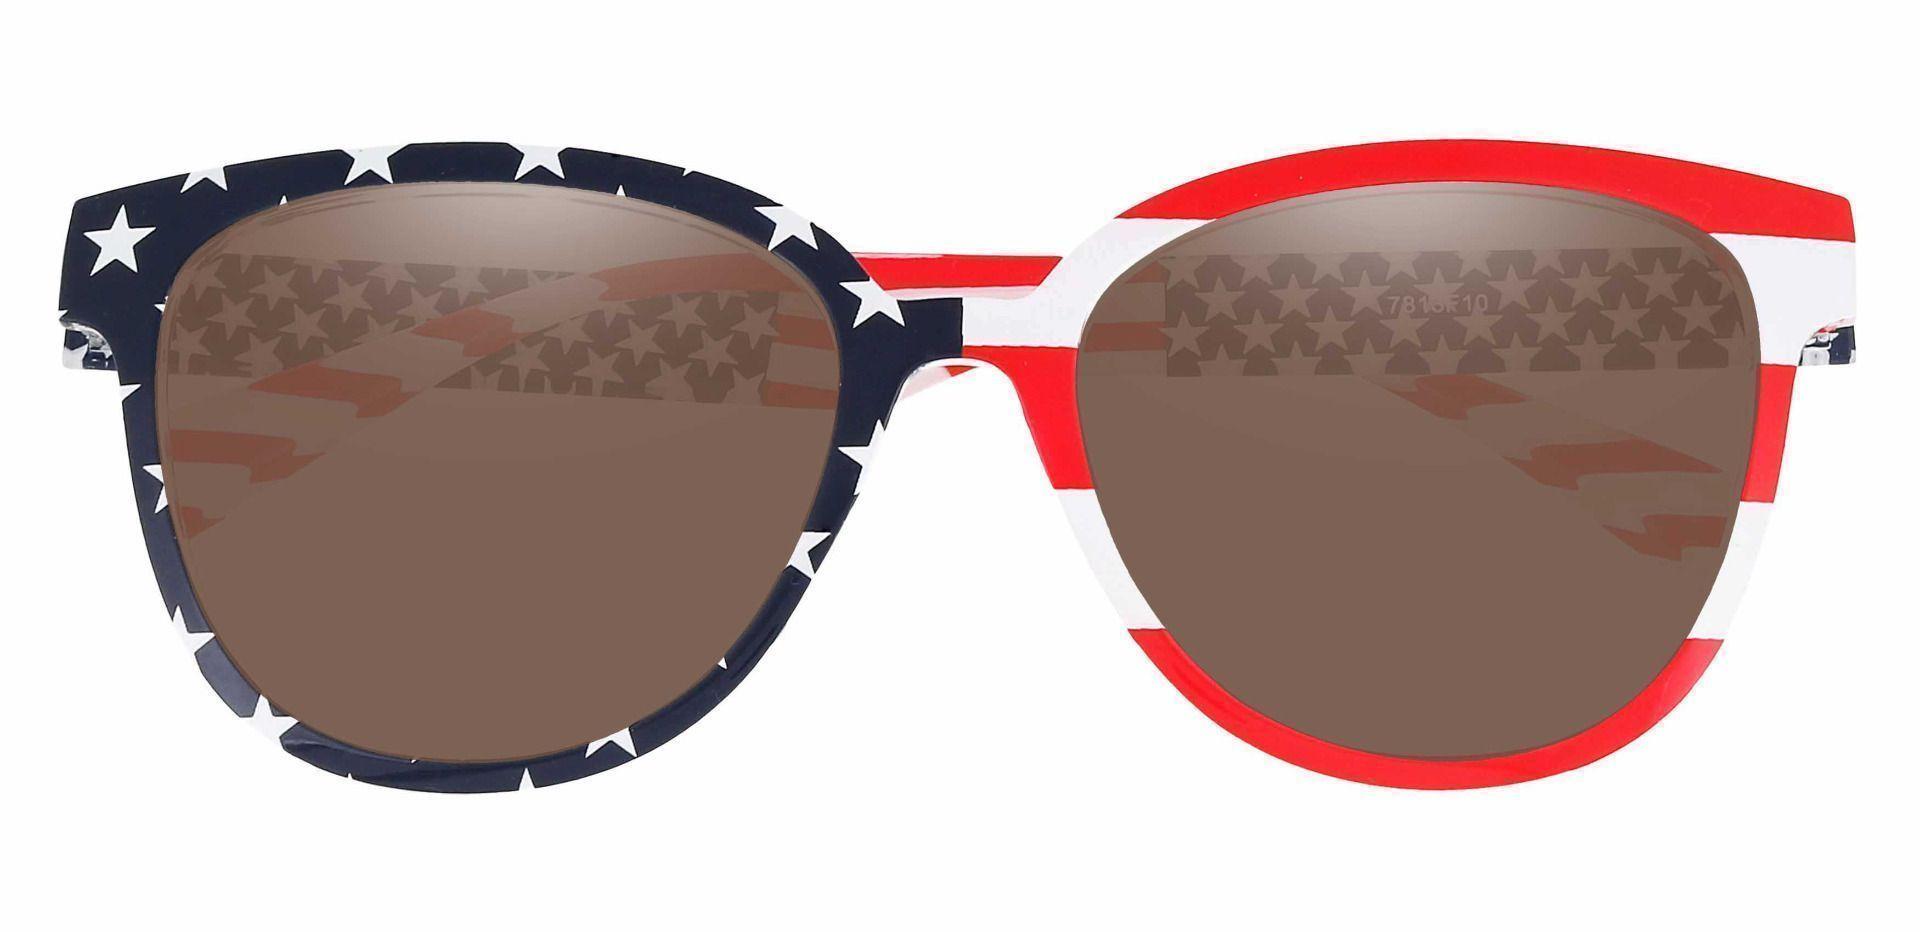 Union Square Progressive Sunglasses - Floral Frame With Brown Lenses